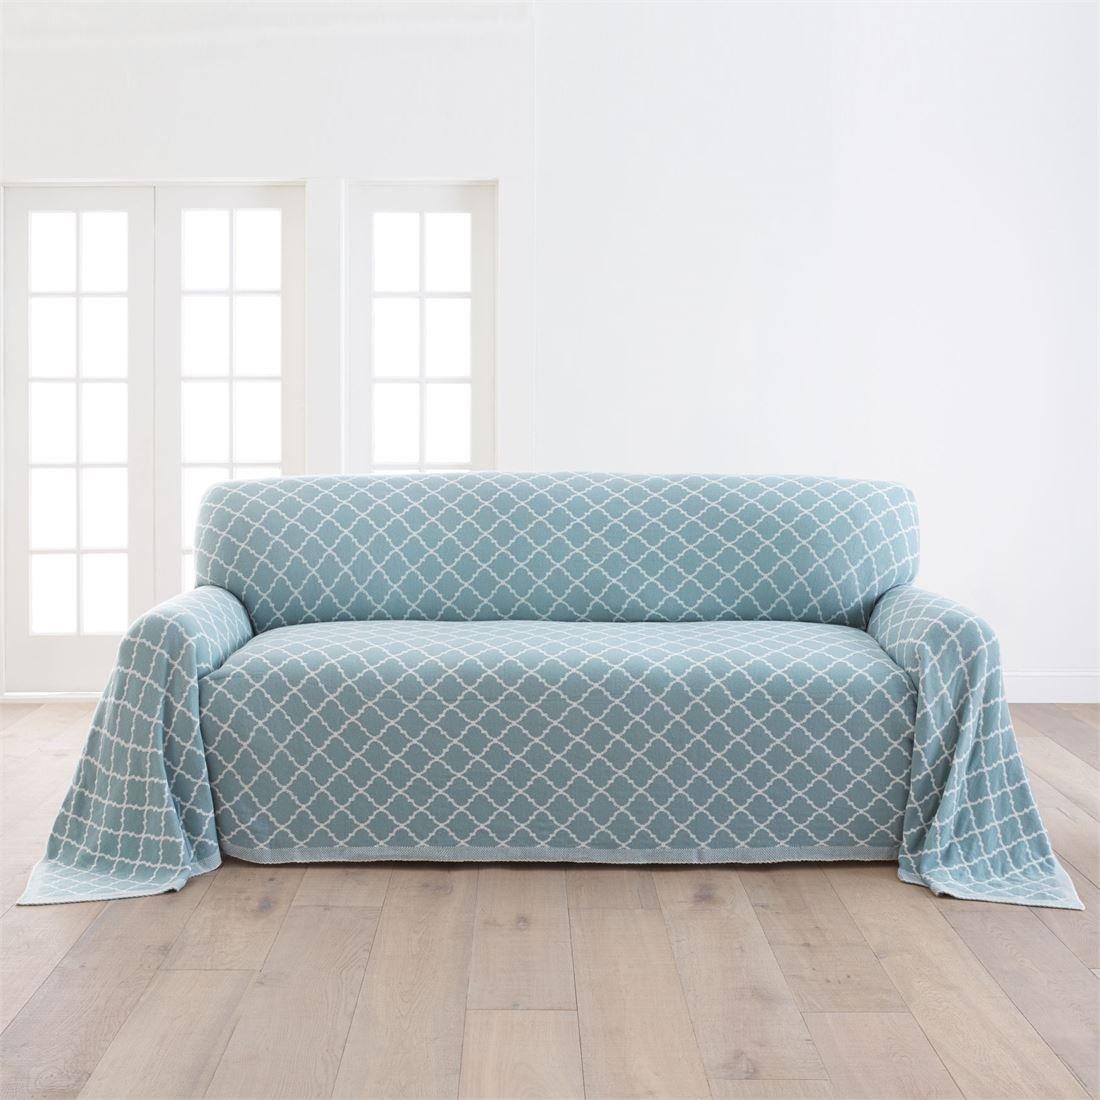 BrylaneHome Ogee Knitted Sofa Cover (Spa,0)